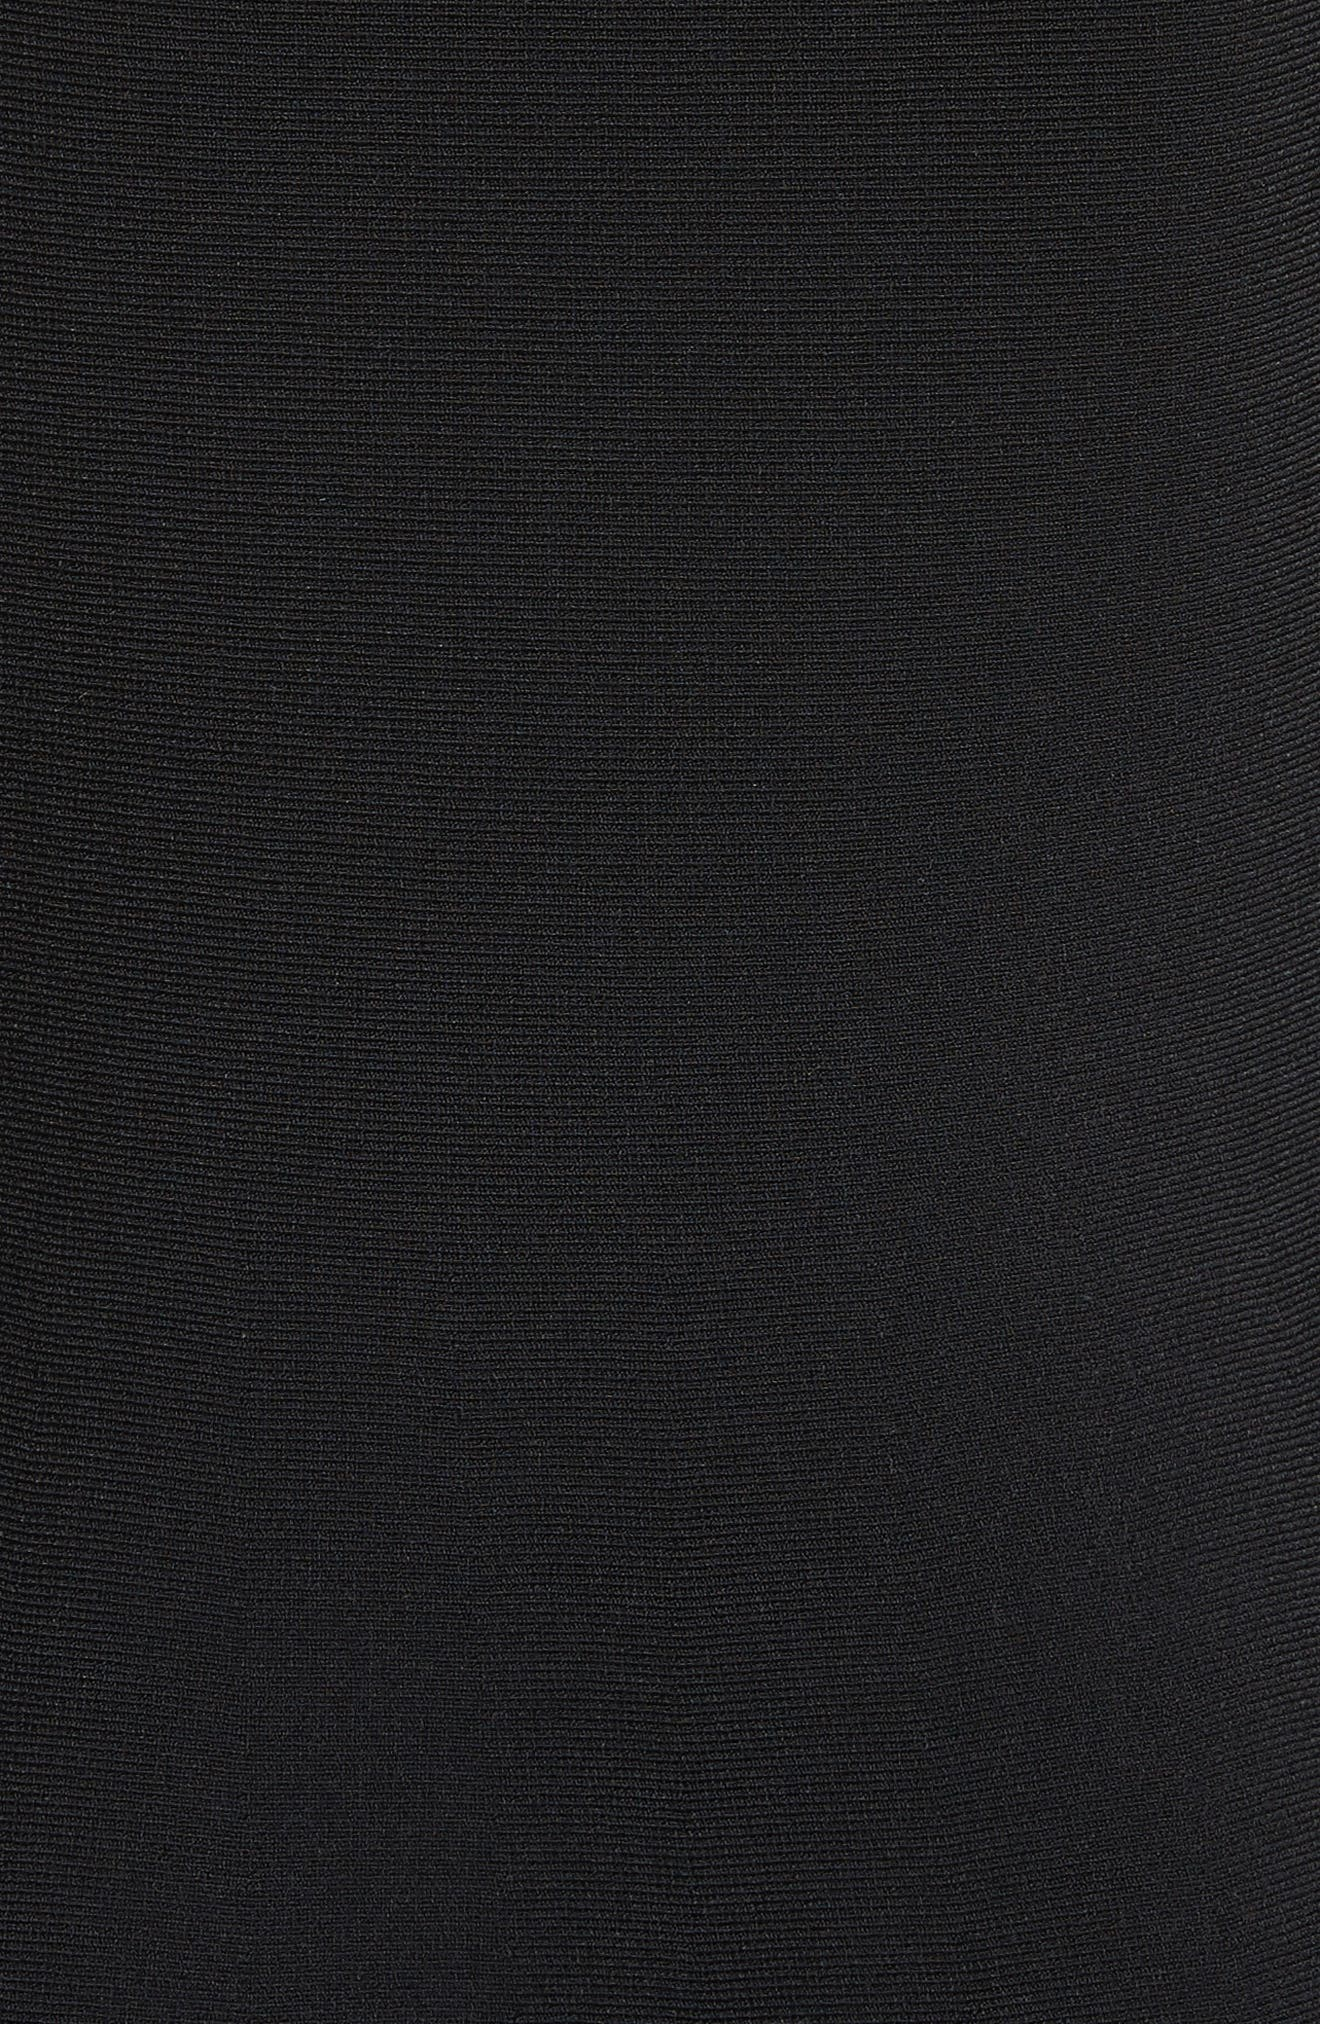 Ruffle Neckline Knit Dress,                             Alternate thumbnail 5, color,                             002